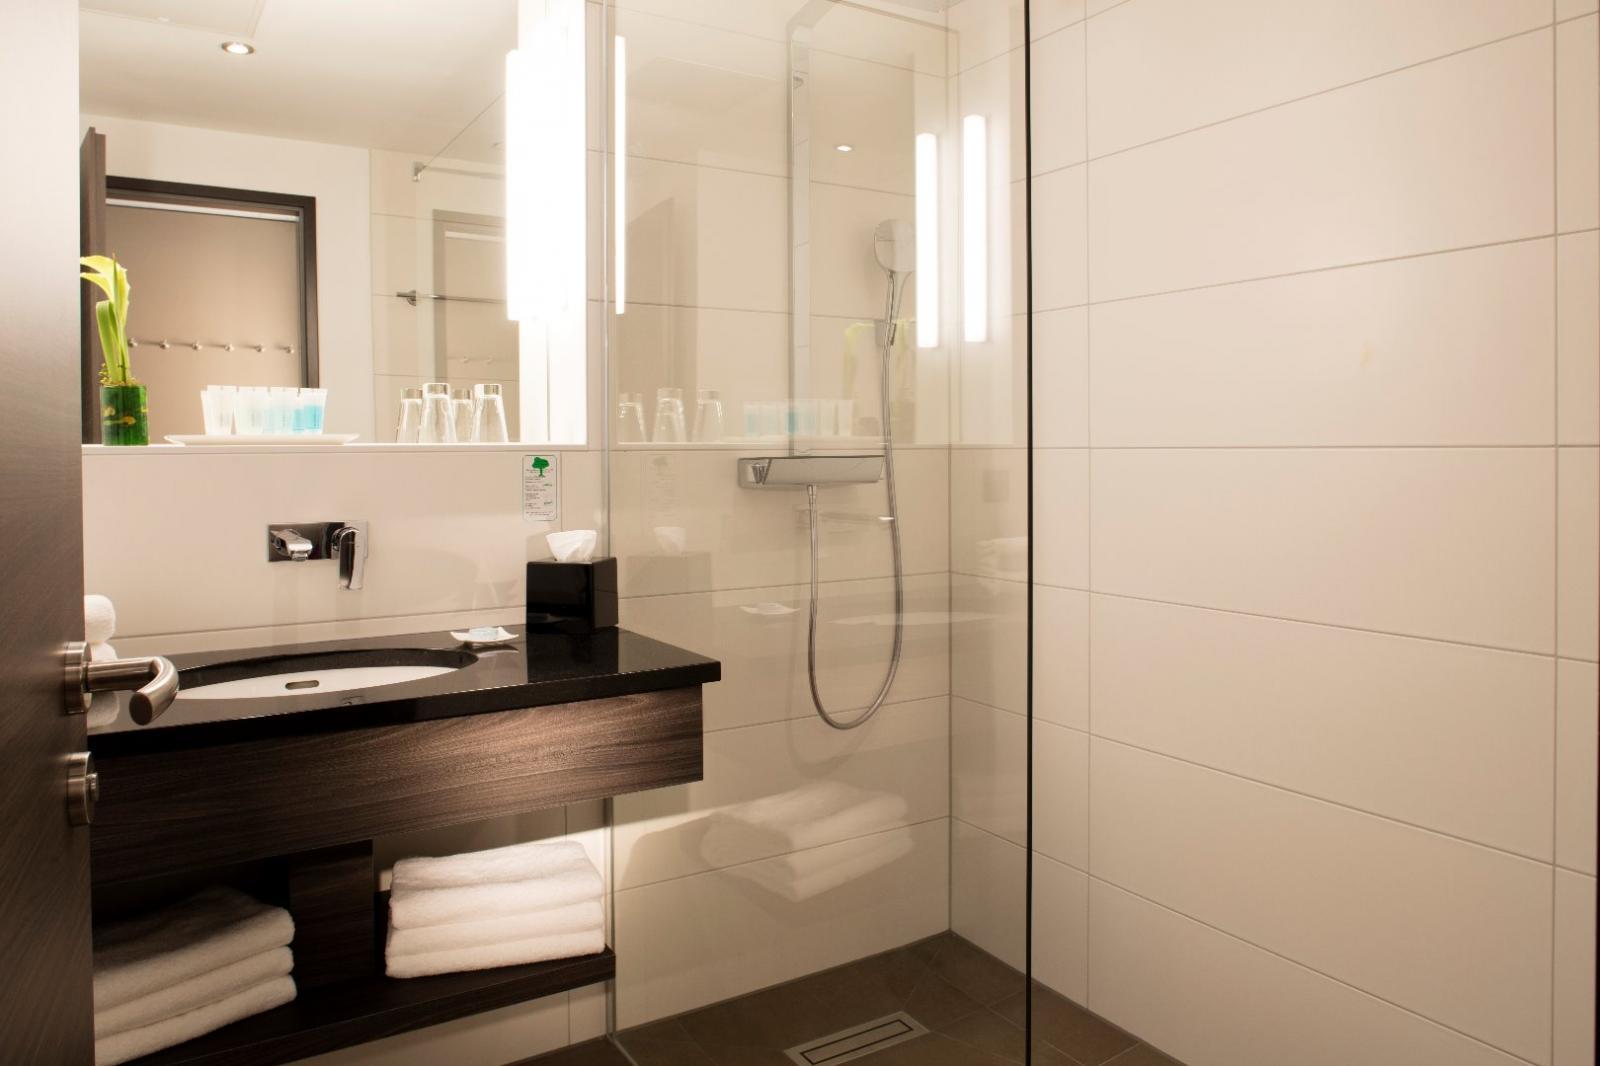 wellnesshotels in frankfurt am main hessen. Black Bedroom Furniture Sets. Home Design Ideas